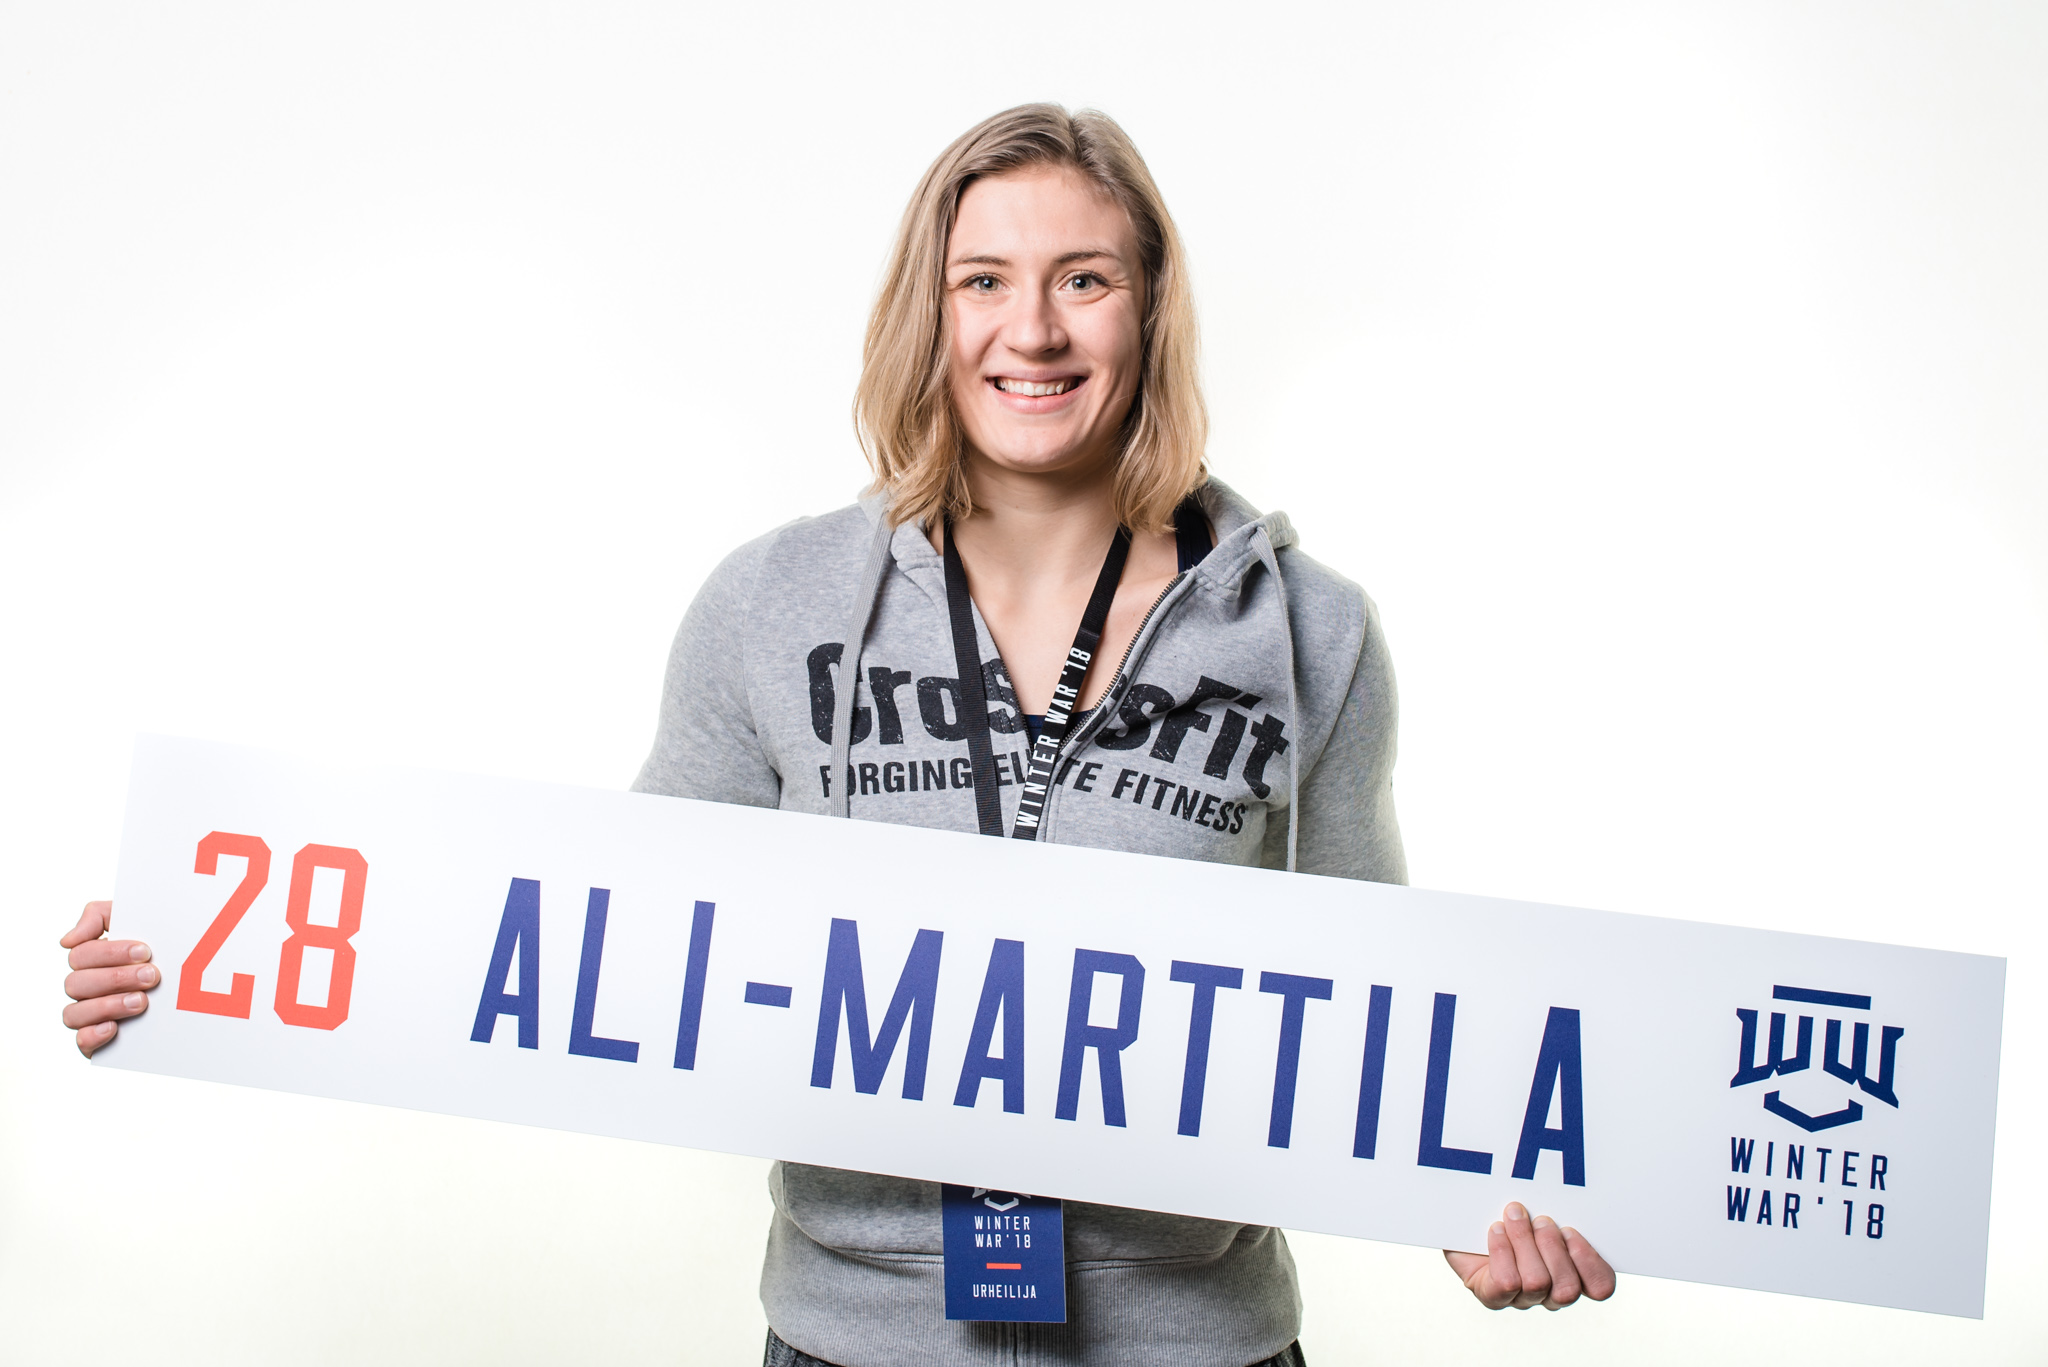 Ali-Marttila